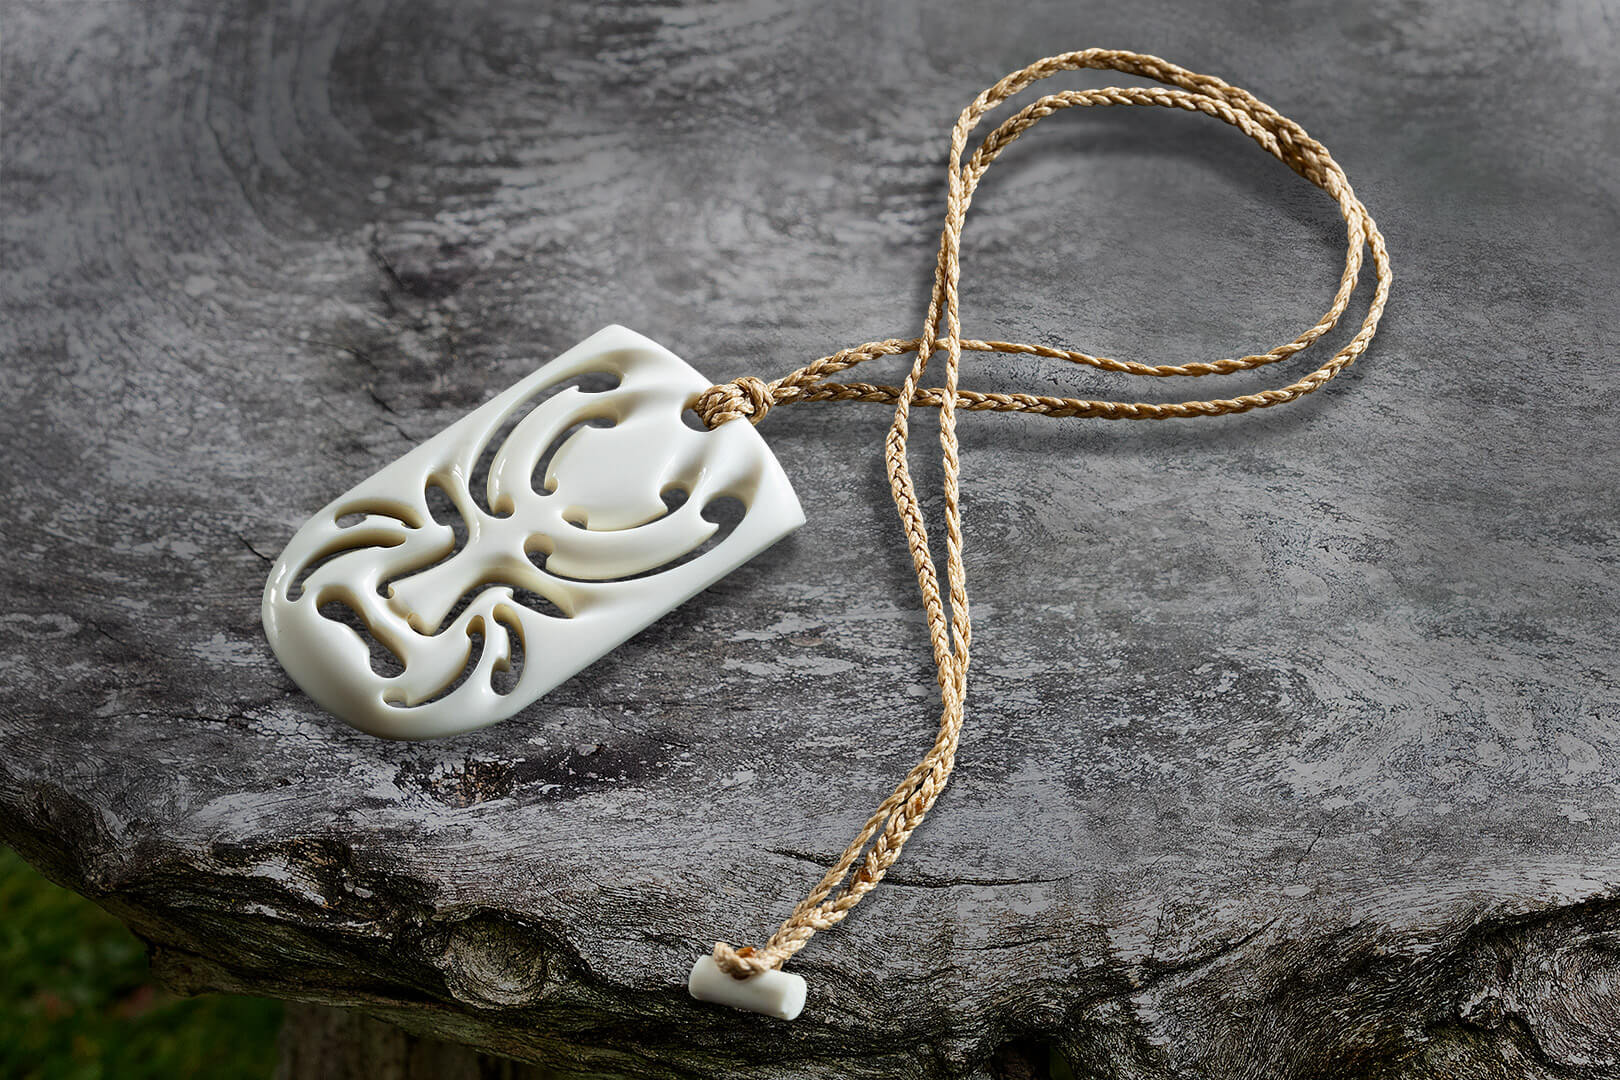 Huna Kanohi (Mask Pendant)